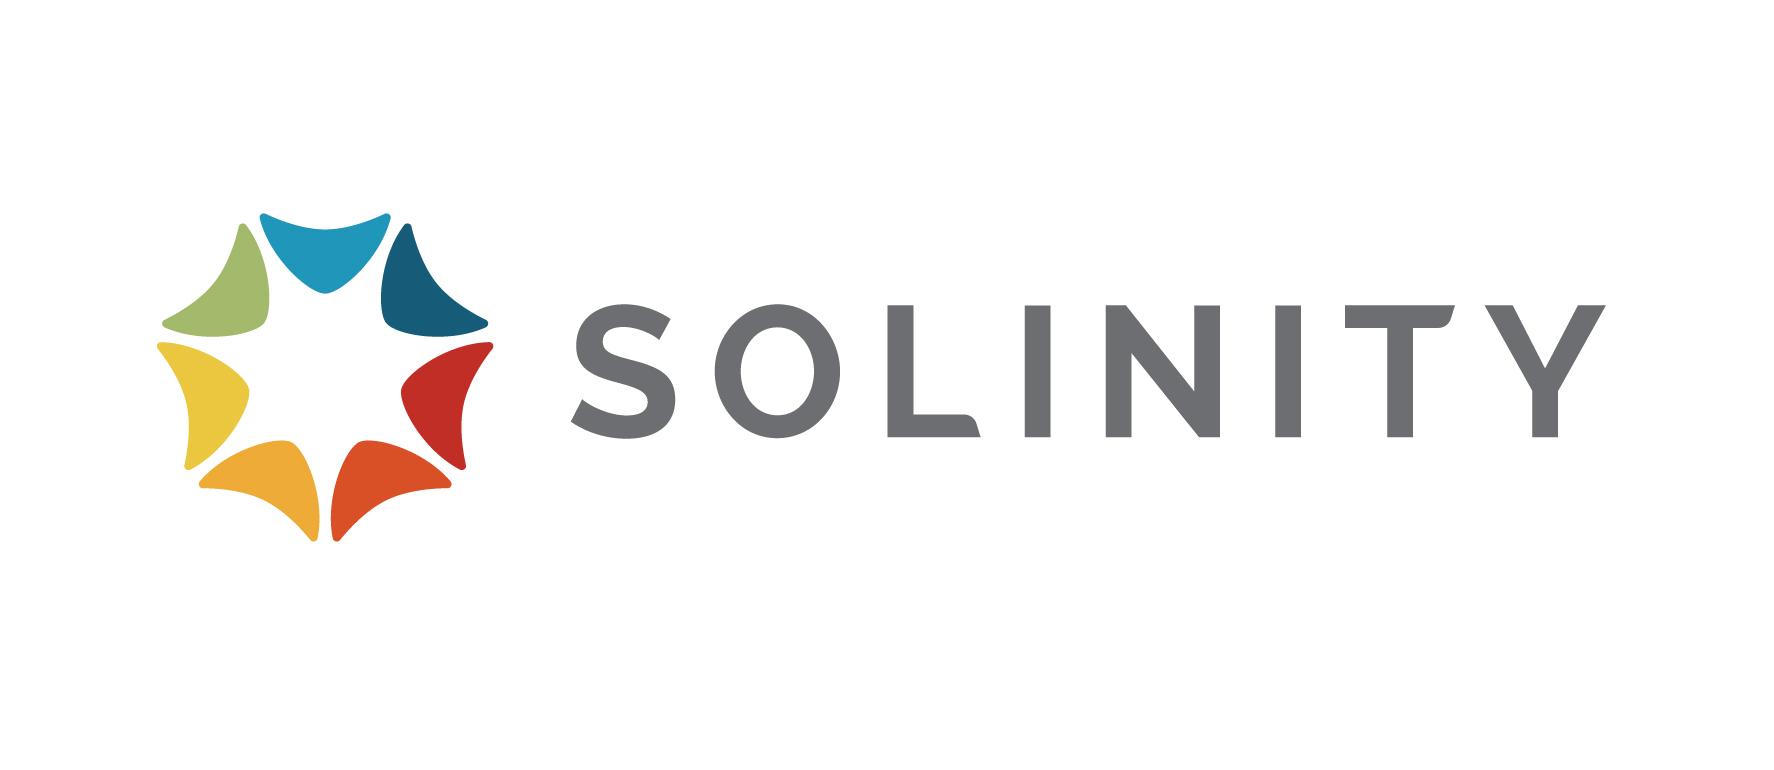 Solinity_logo_Horizontal-01.jpg